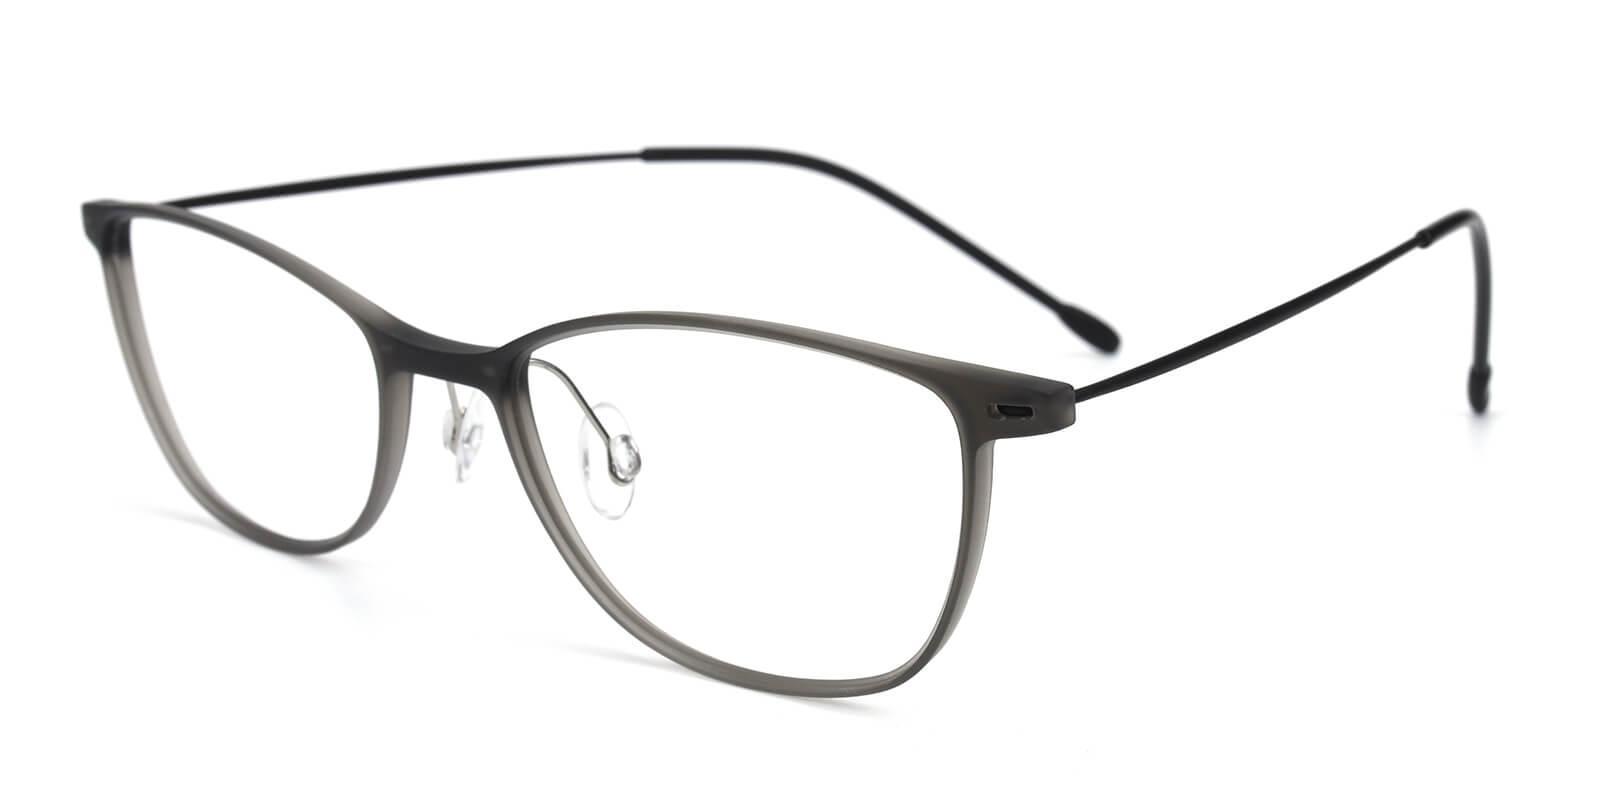 Pridgen-Gray-Rectangle / Cat-Combination-Eyeglasses-additional1